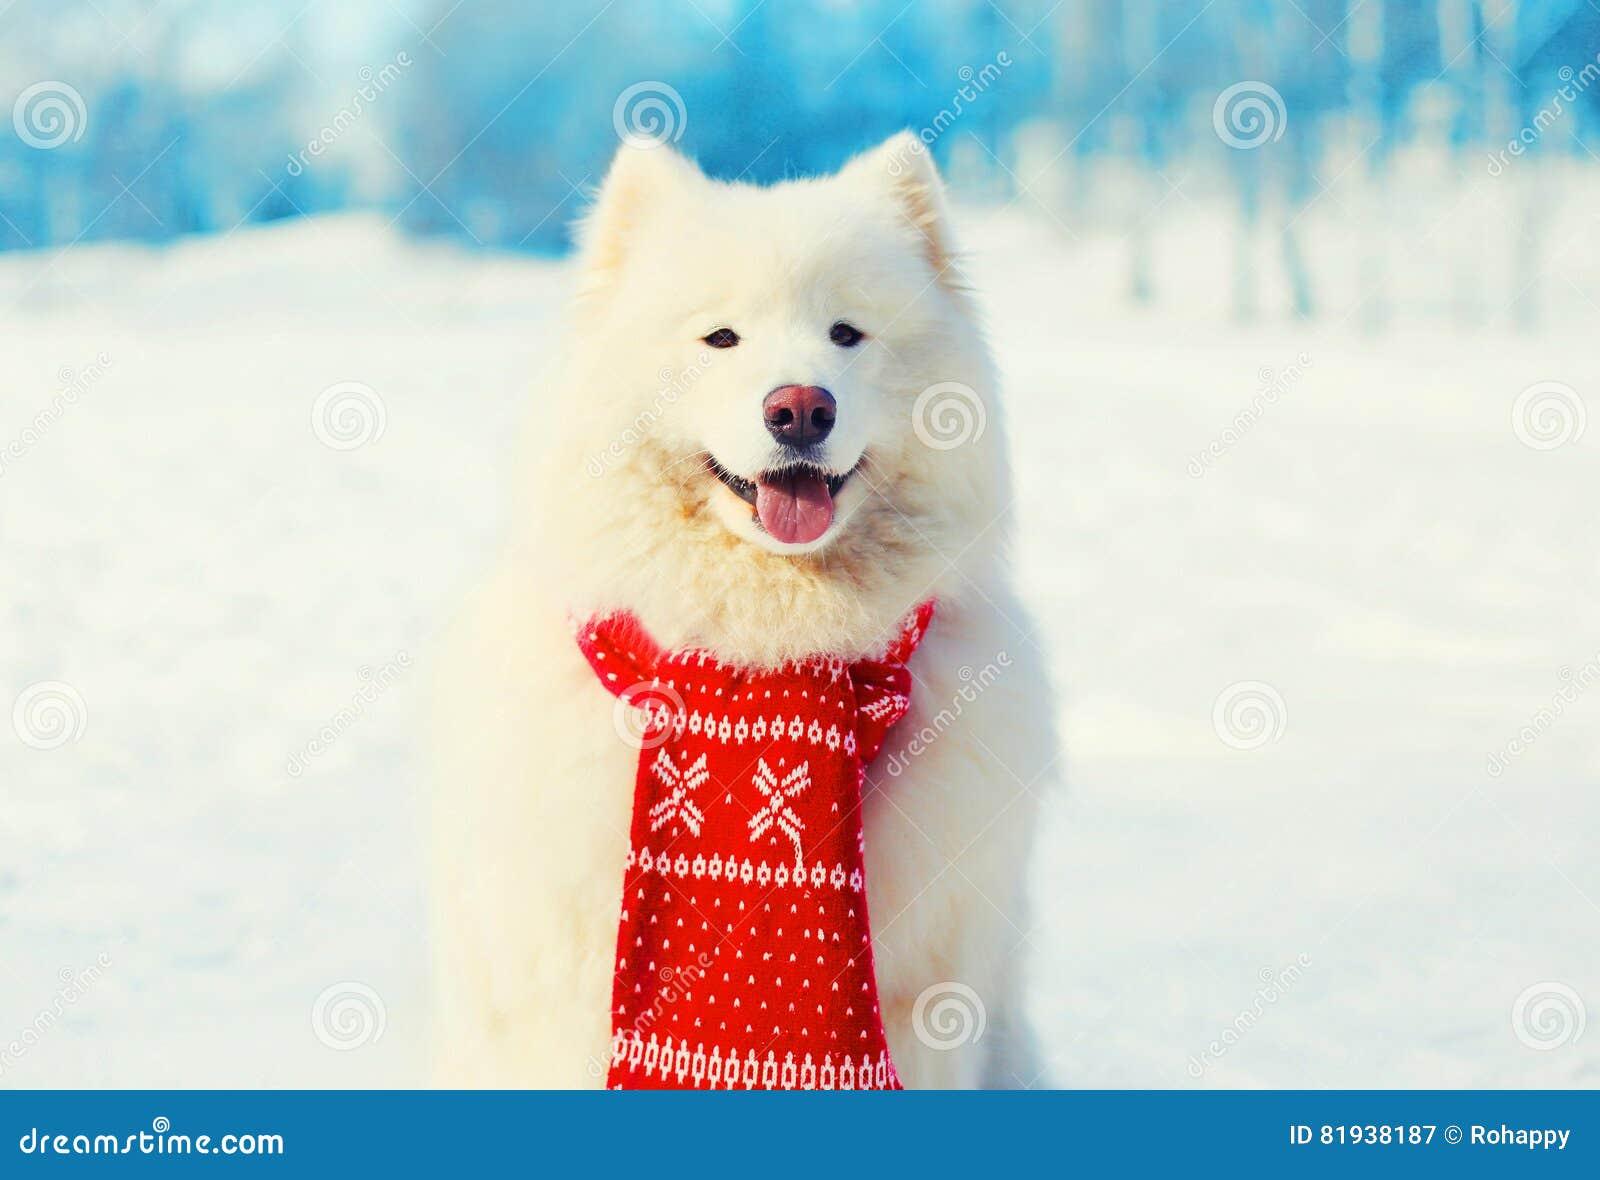 b17ea87feb0 Winter White Samoyed Dog In Scarf On Snow Stock Image - Image of ...